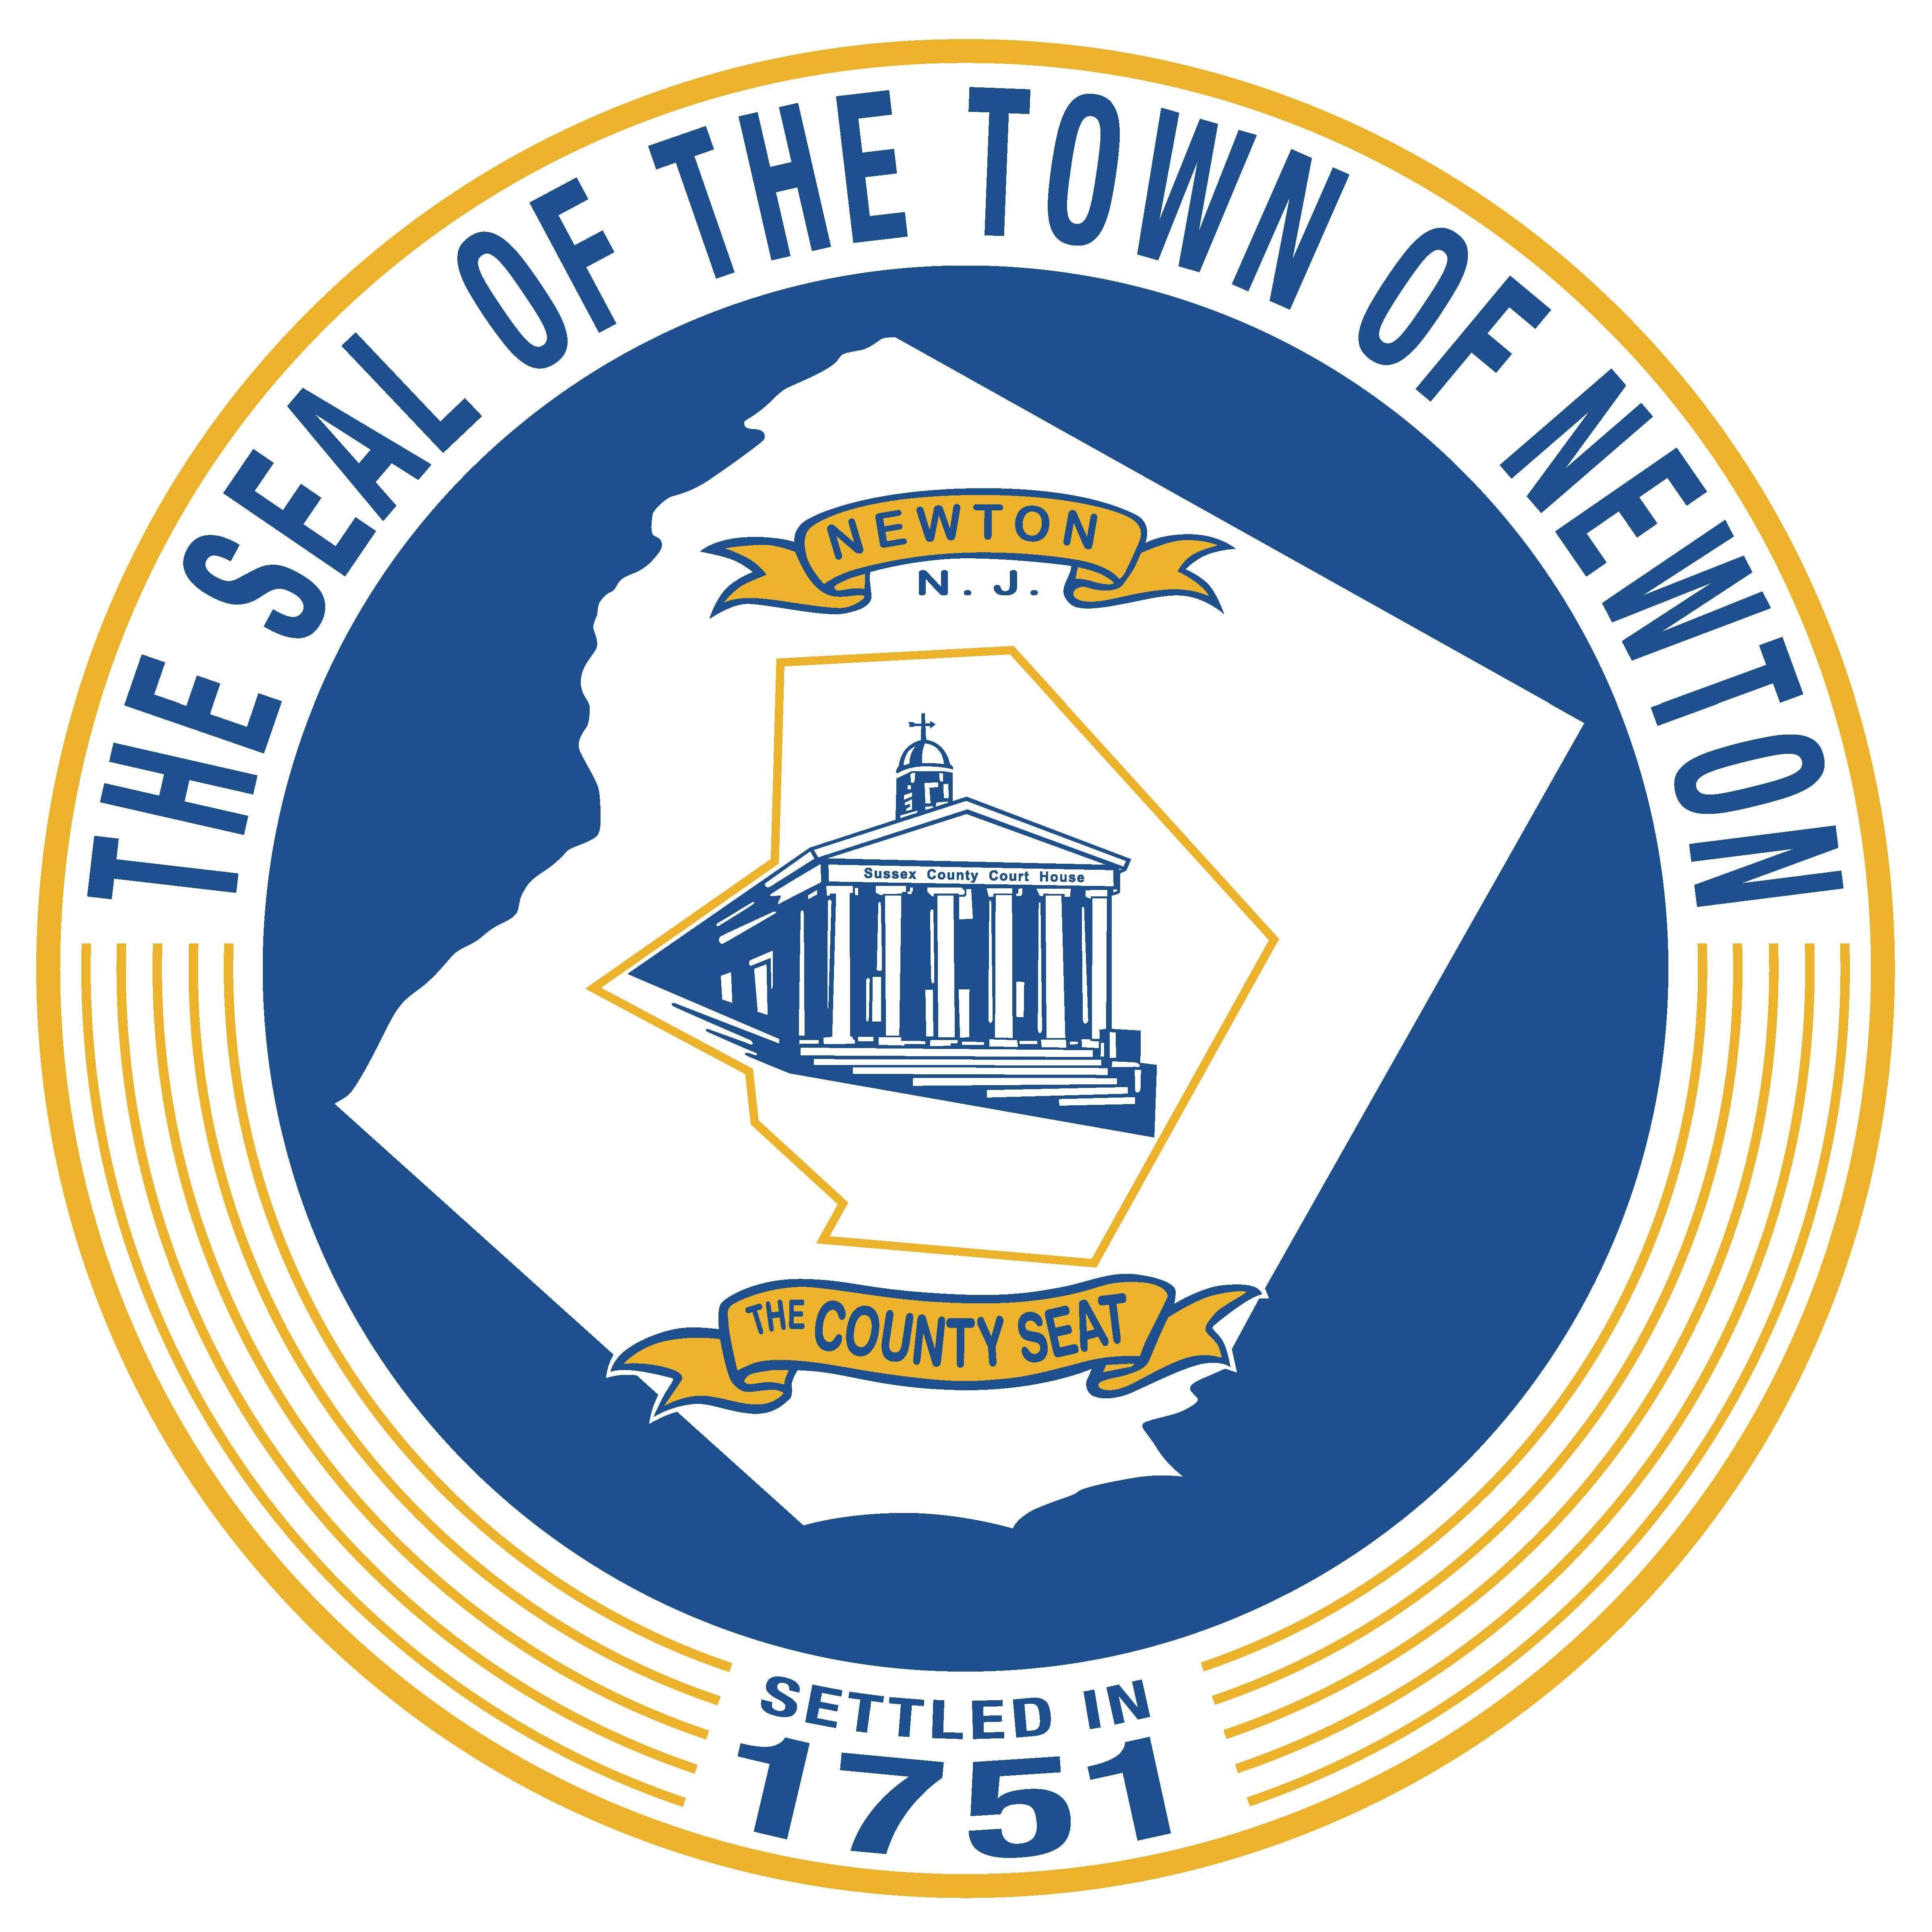 5a01c6c350b8a78688ec_Town_Seal_05_blue_v1.jpg